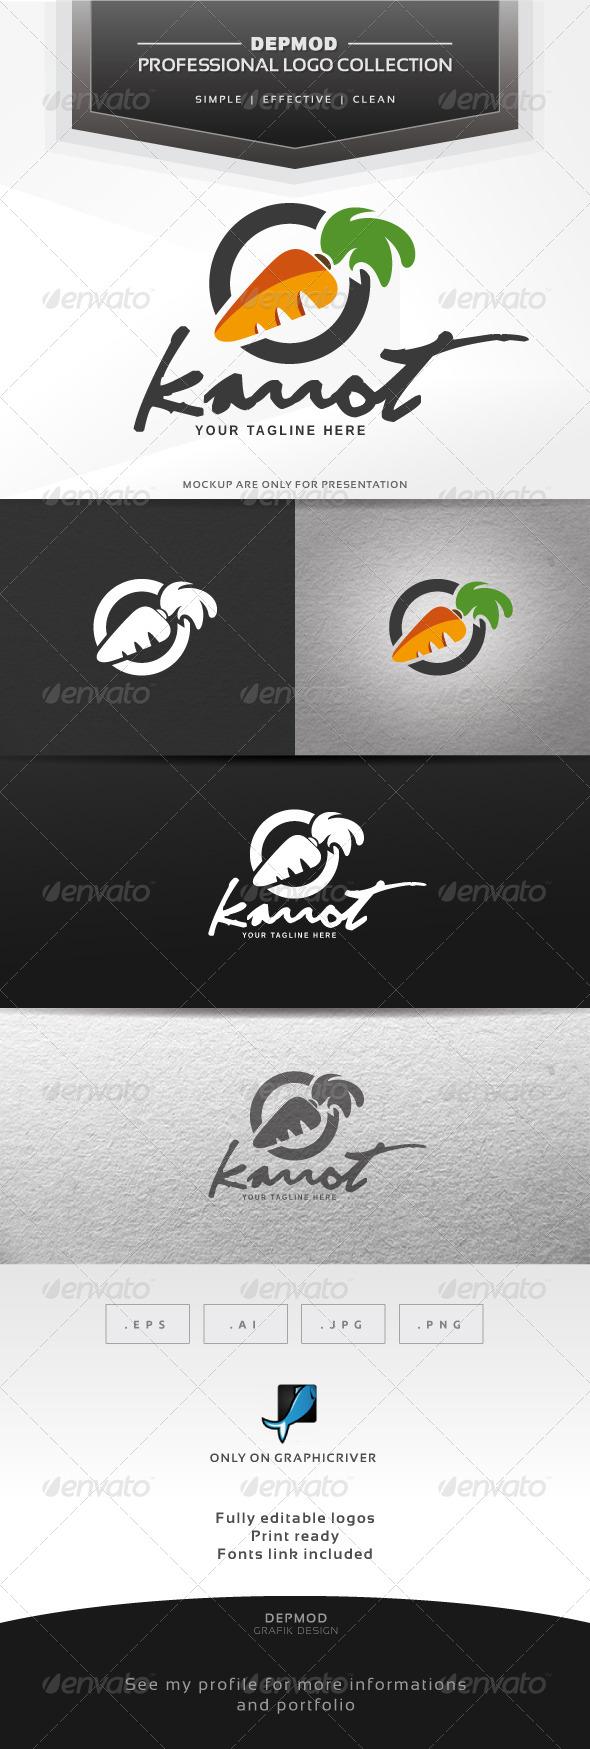 GraphicRiver Karrot Logo 6330556